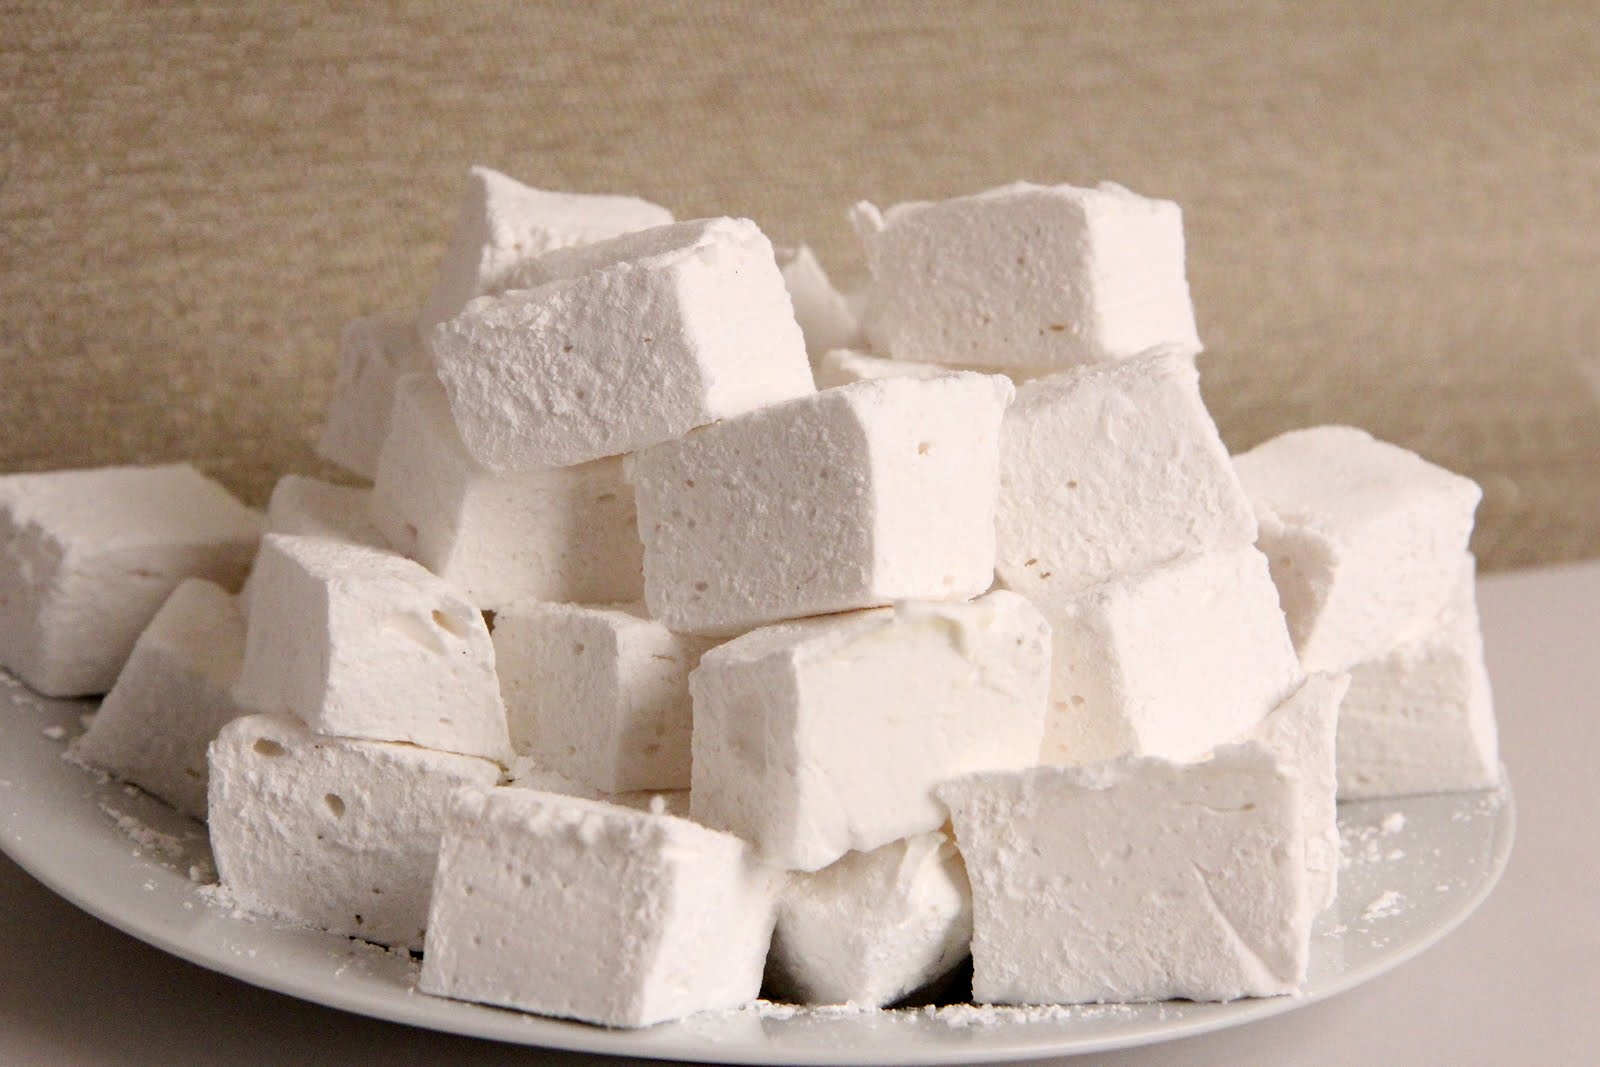 How To Make Homemade Marshmallows